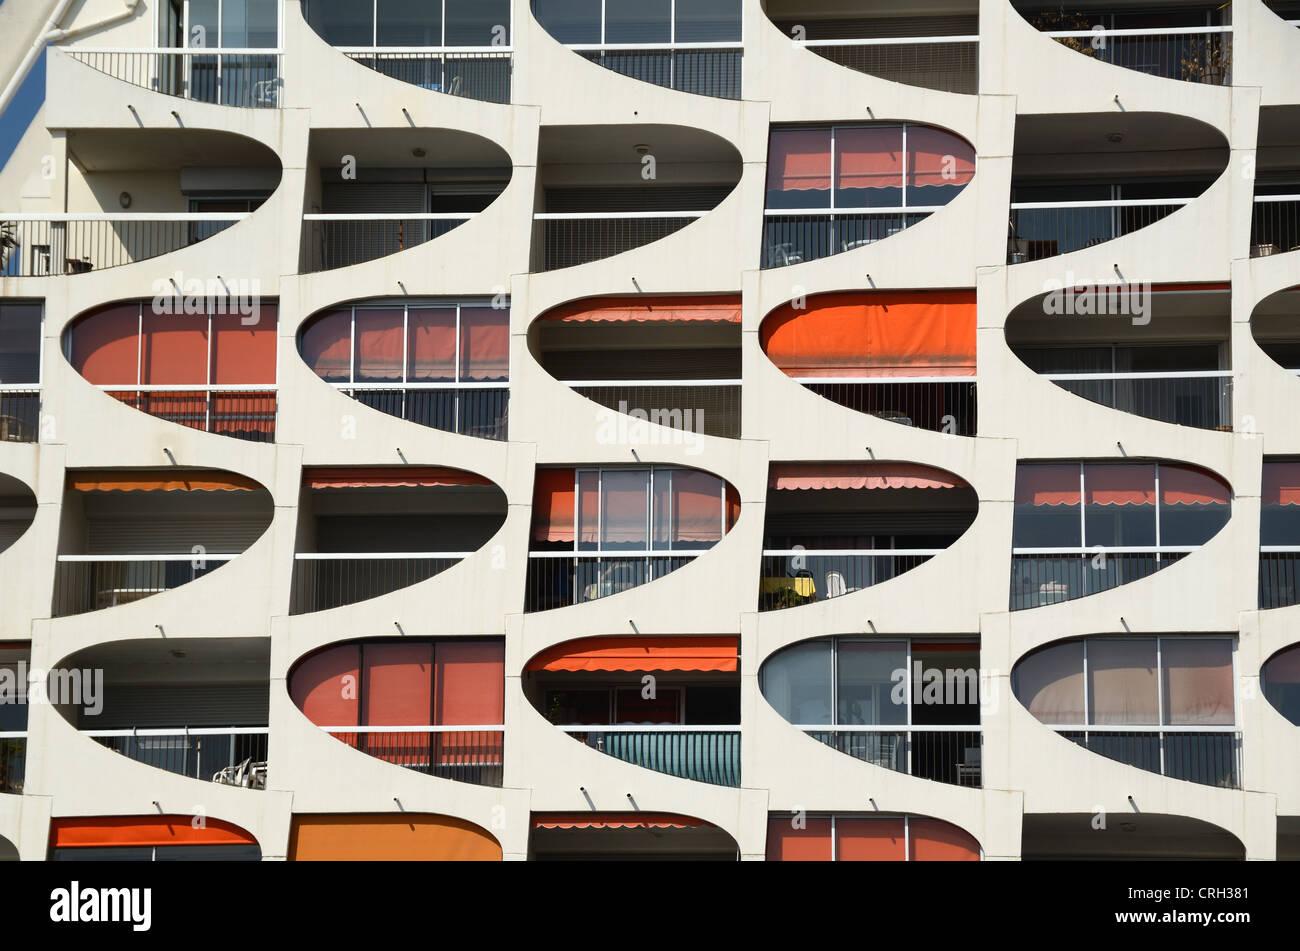 Window Patterns of Modernist Apartment Building or Block of Holiday Flats at La Grande-Motte Hérault France - Stock Image